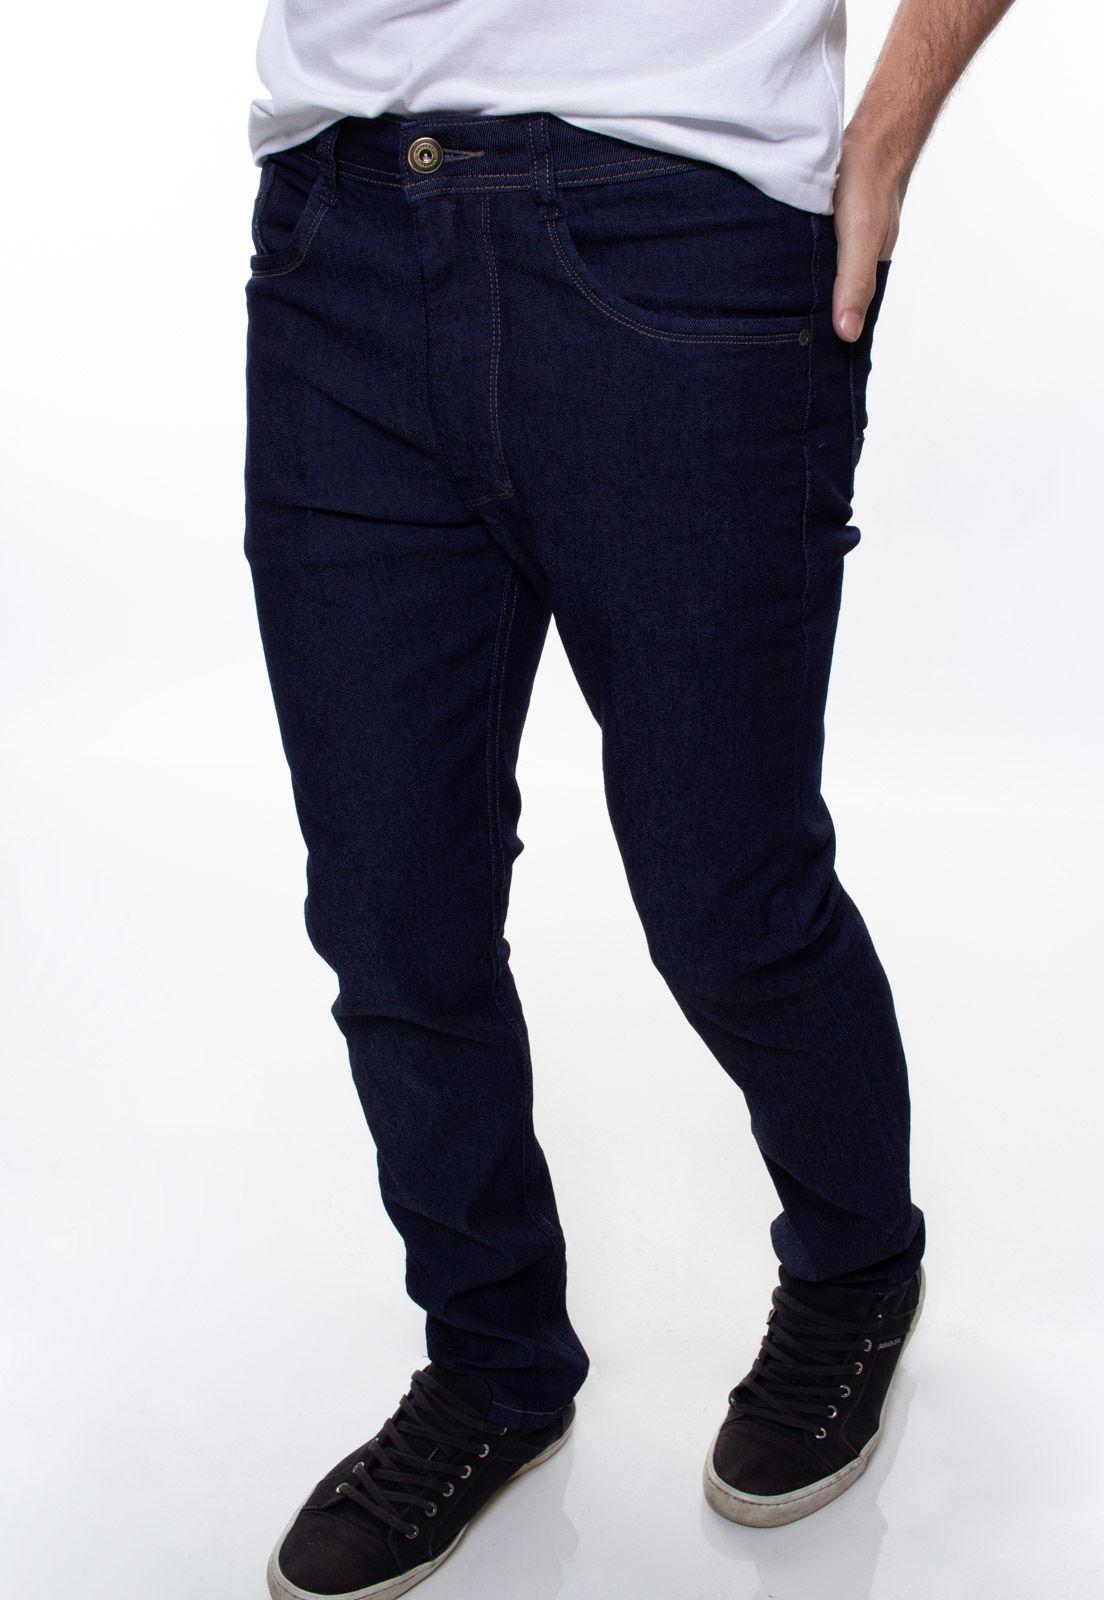 Calça Confort Jeans Masculina Crocker - 47764  - CROCKER JEANS